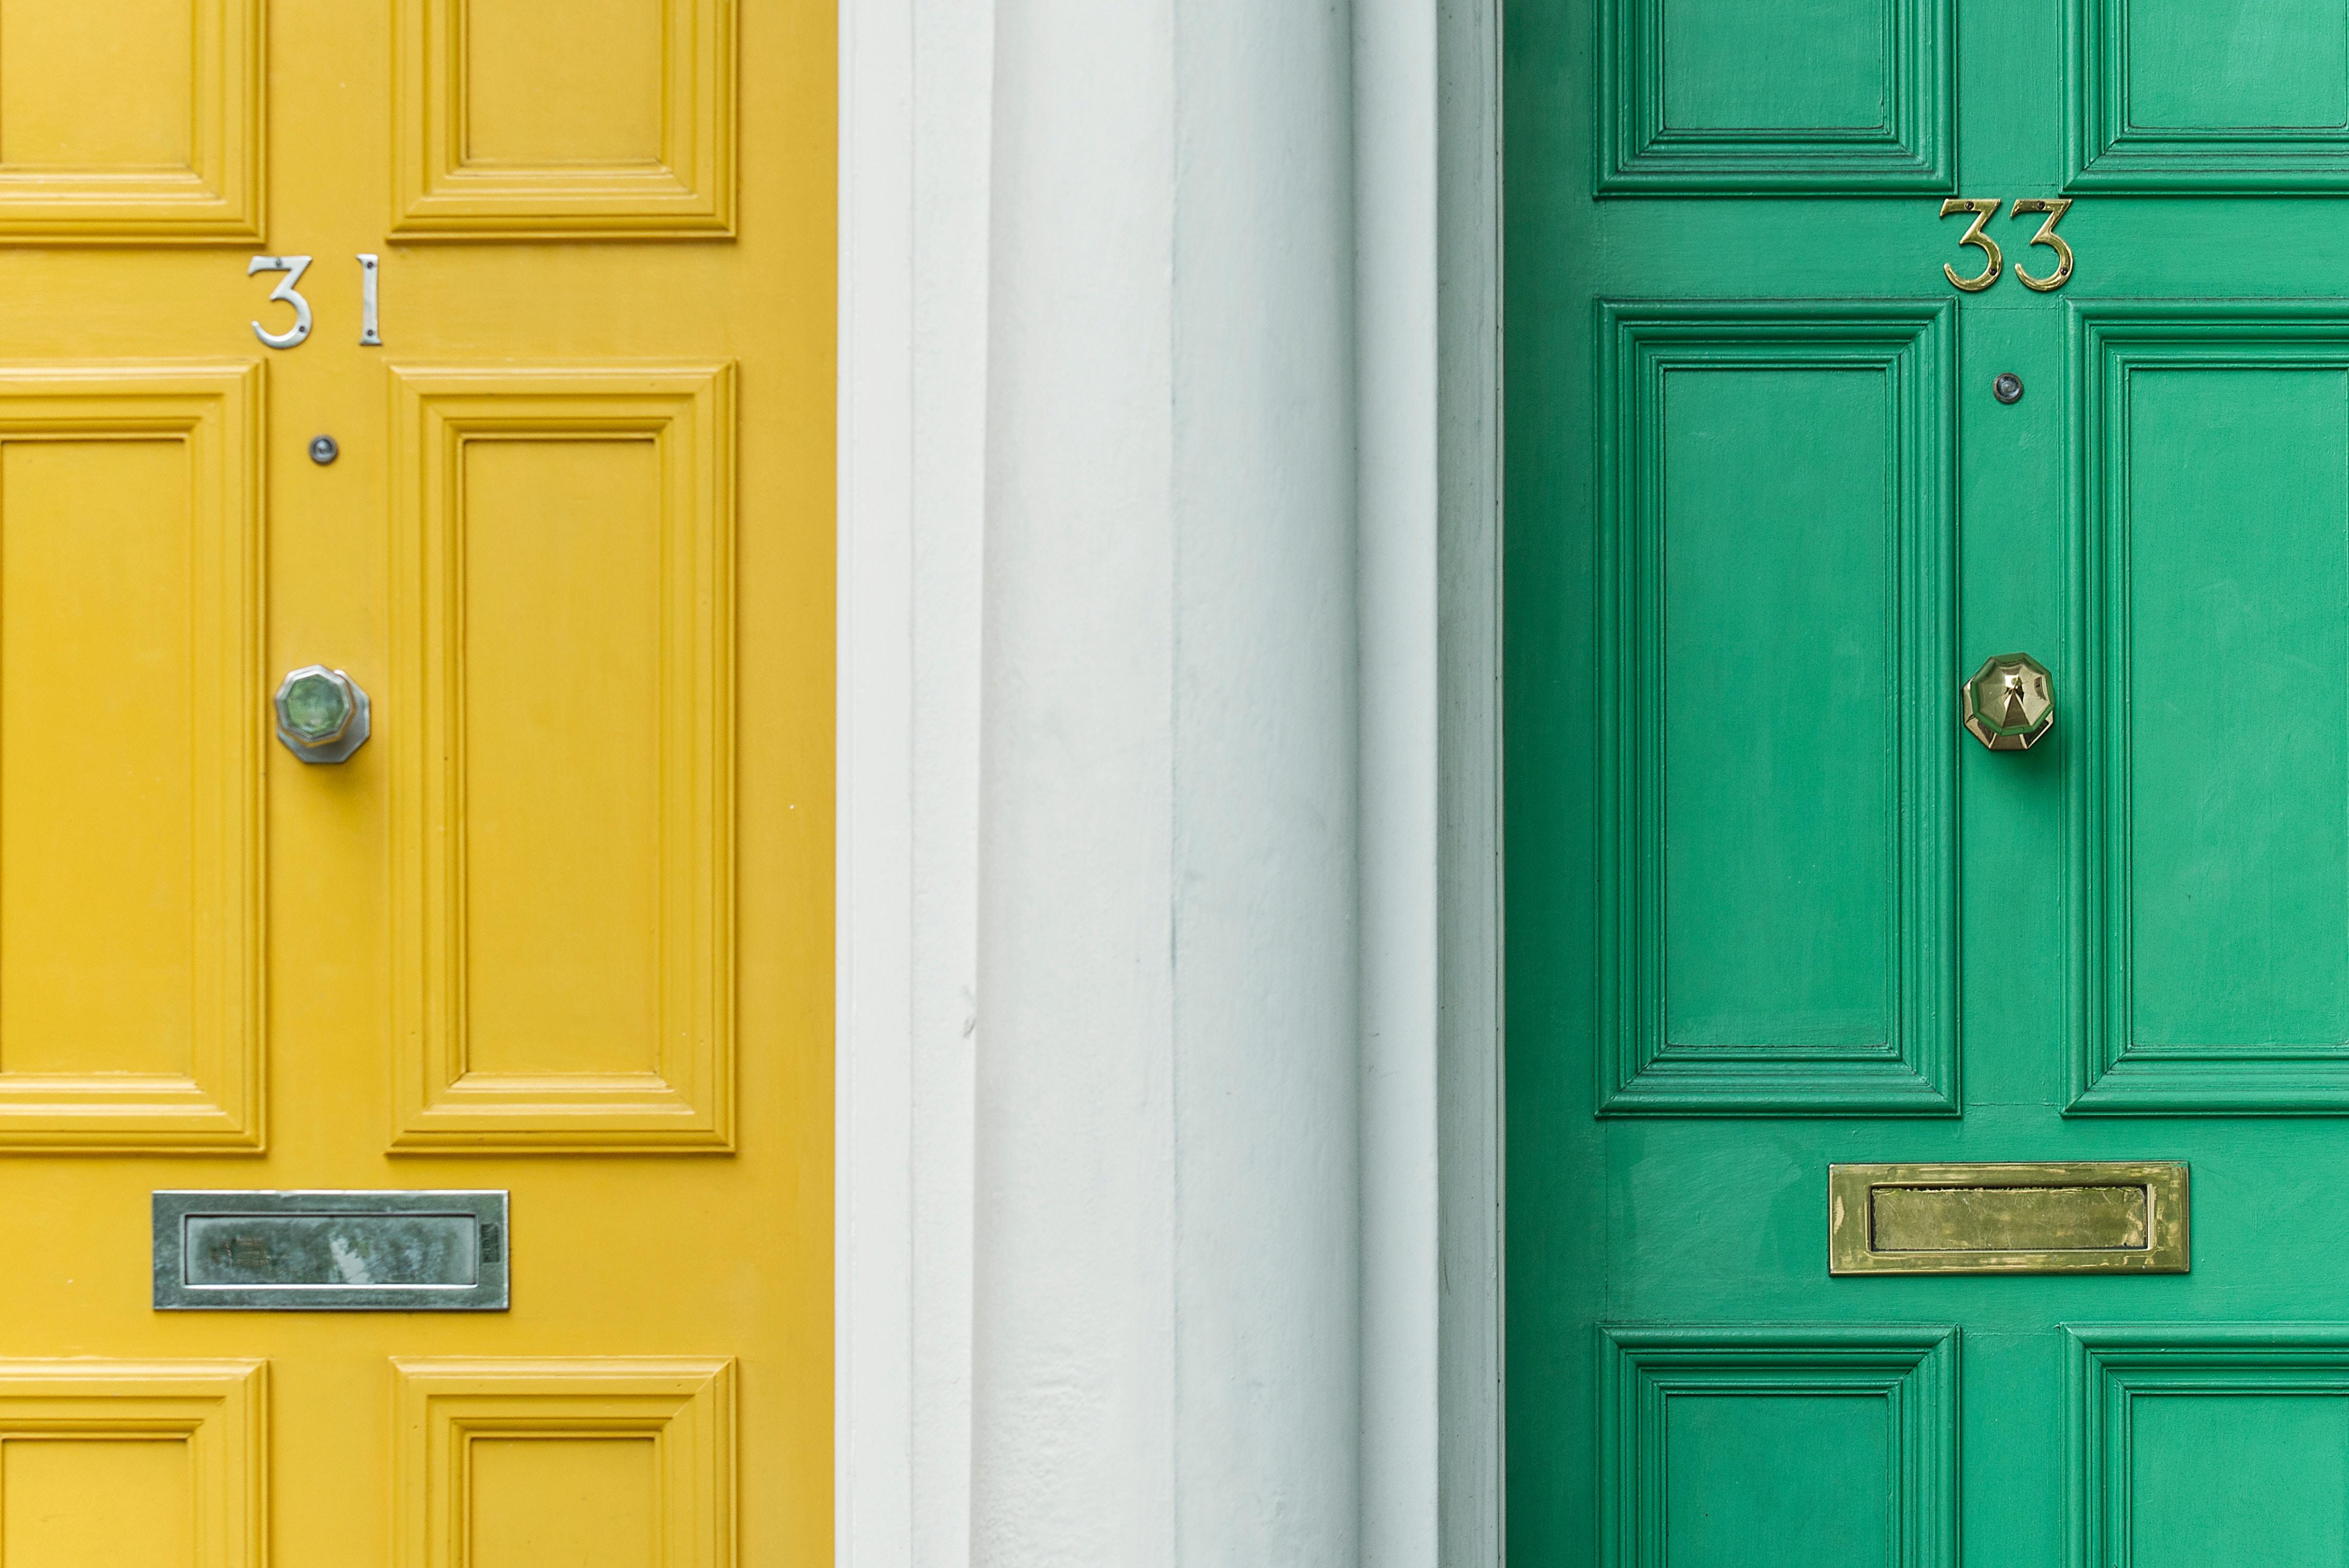 Porte colorate a Londra